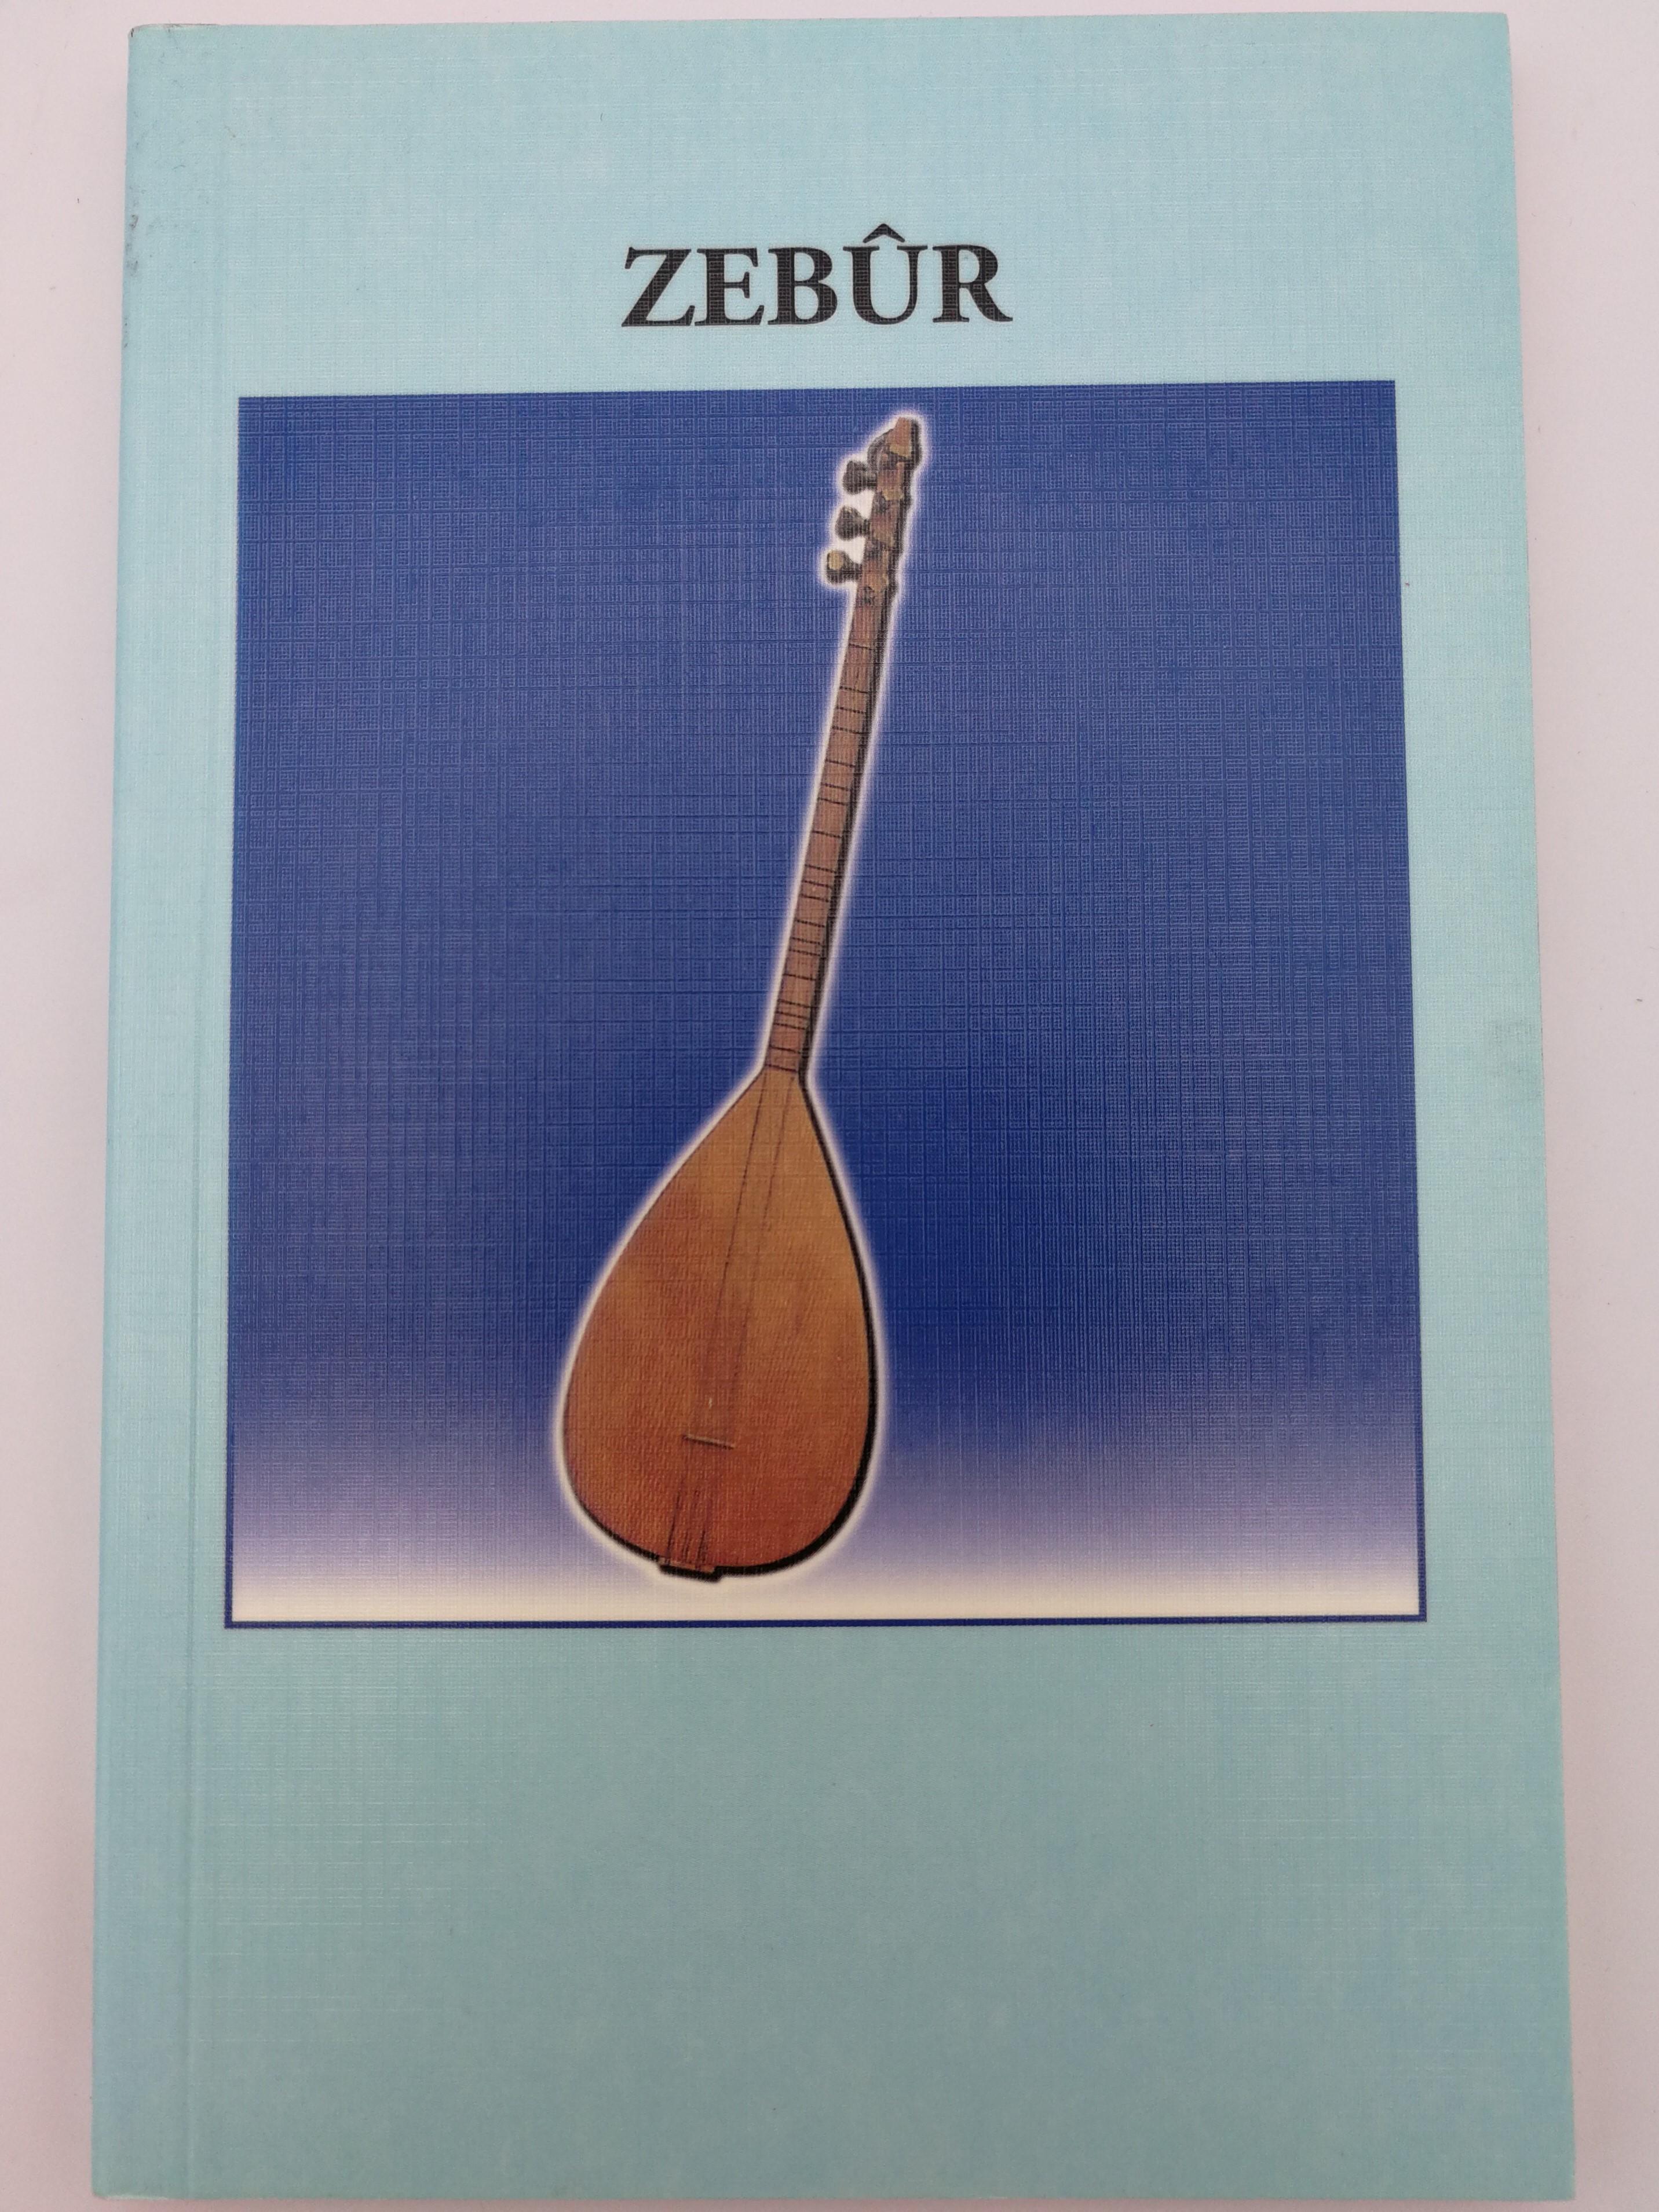 zebur-the-psalms-in-kurdish-kurmanji-1.jpg